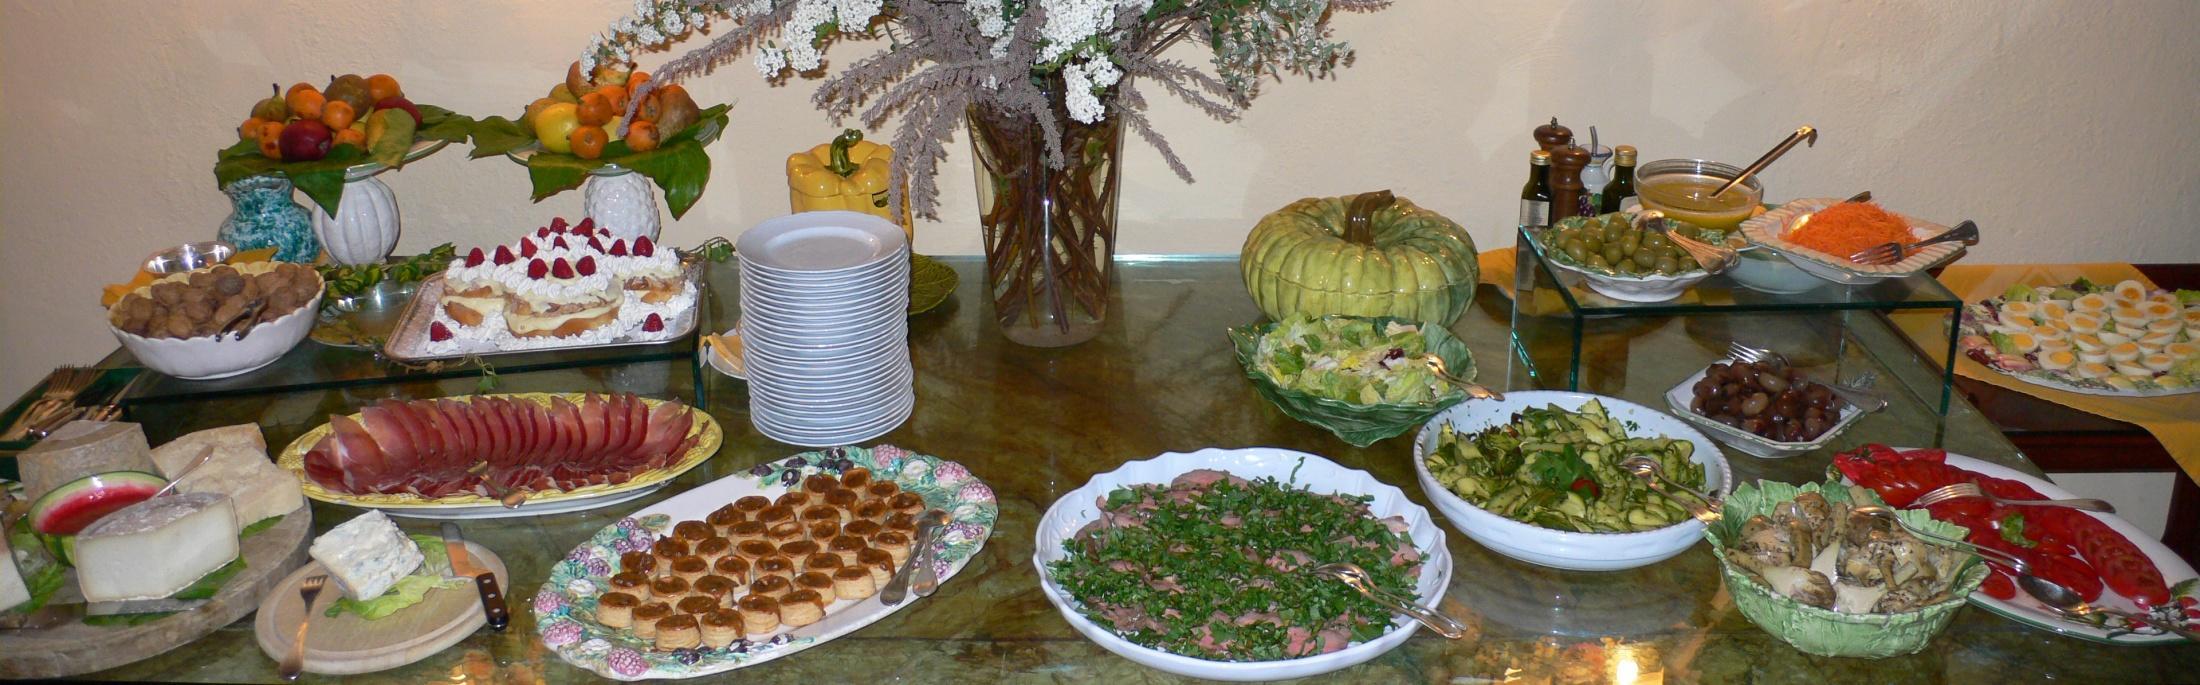 Villa Le Barone - Cucina e vino